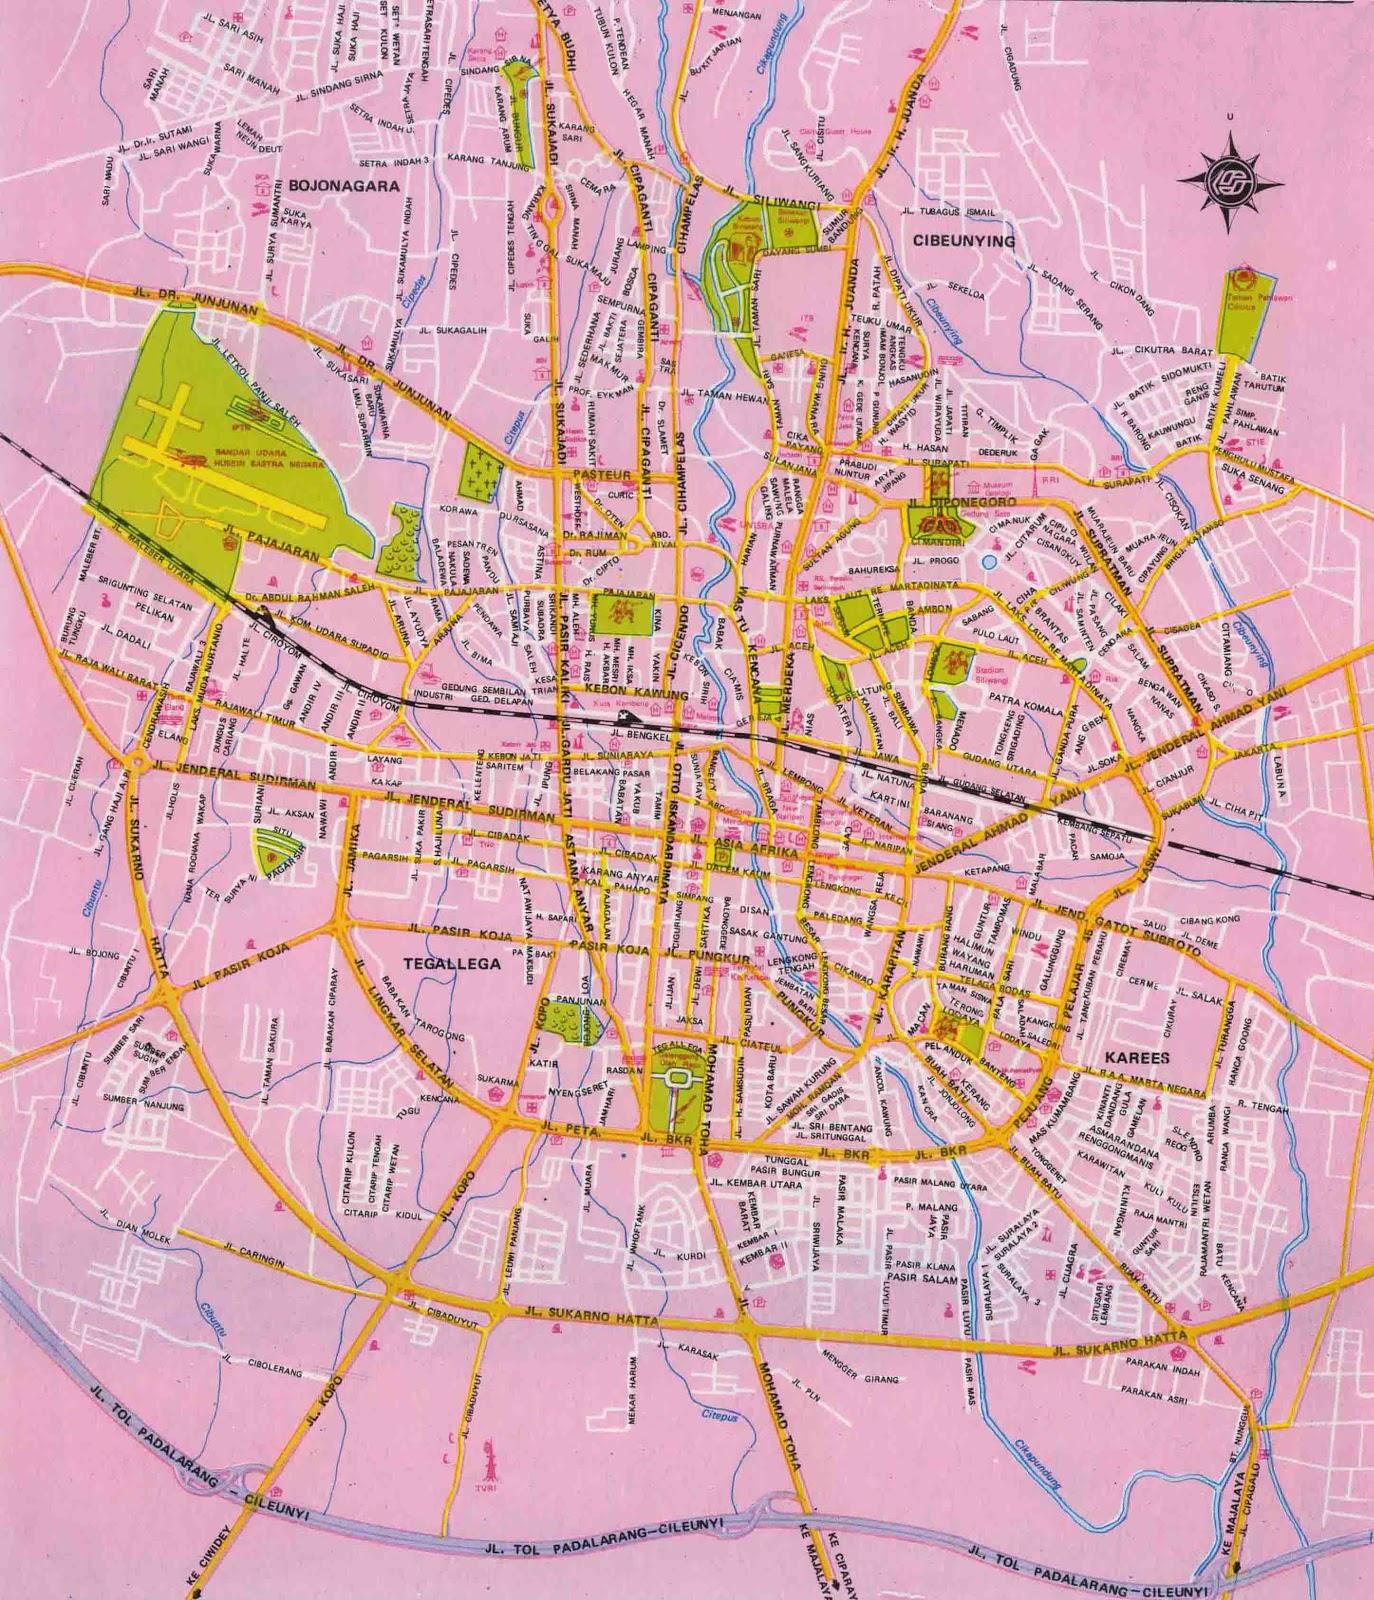 Amazing indonesia bandung city tourism map bandung city tourism map englishindonesia sciox Choice Image